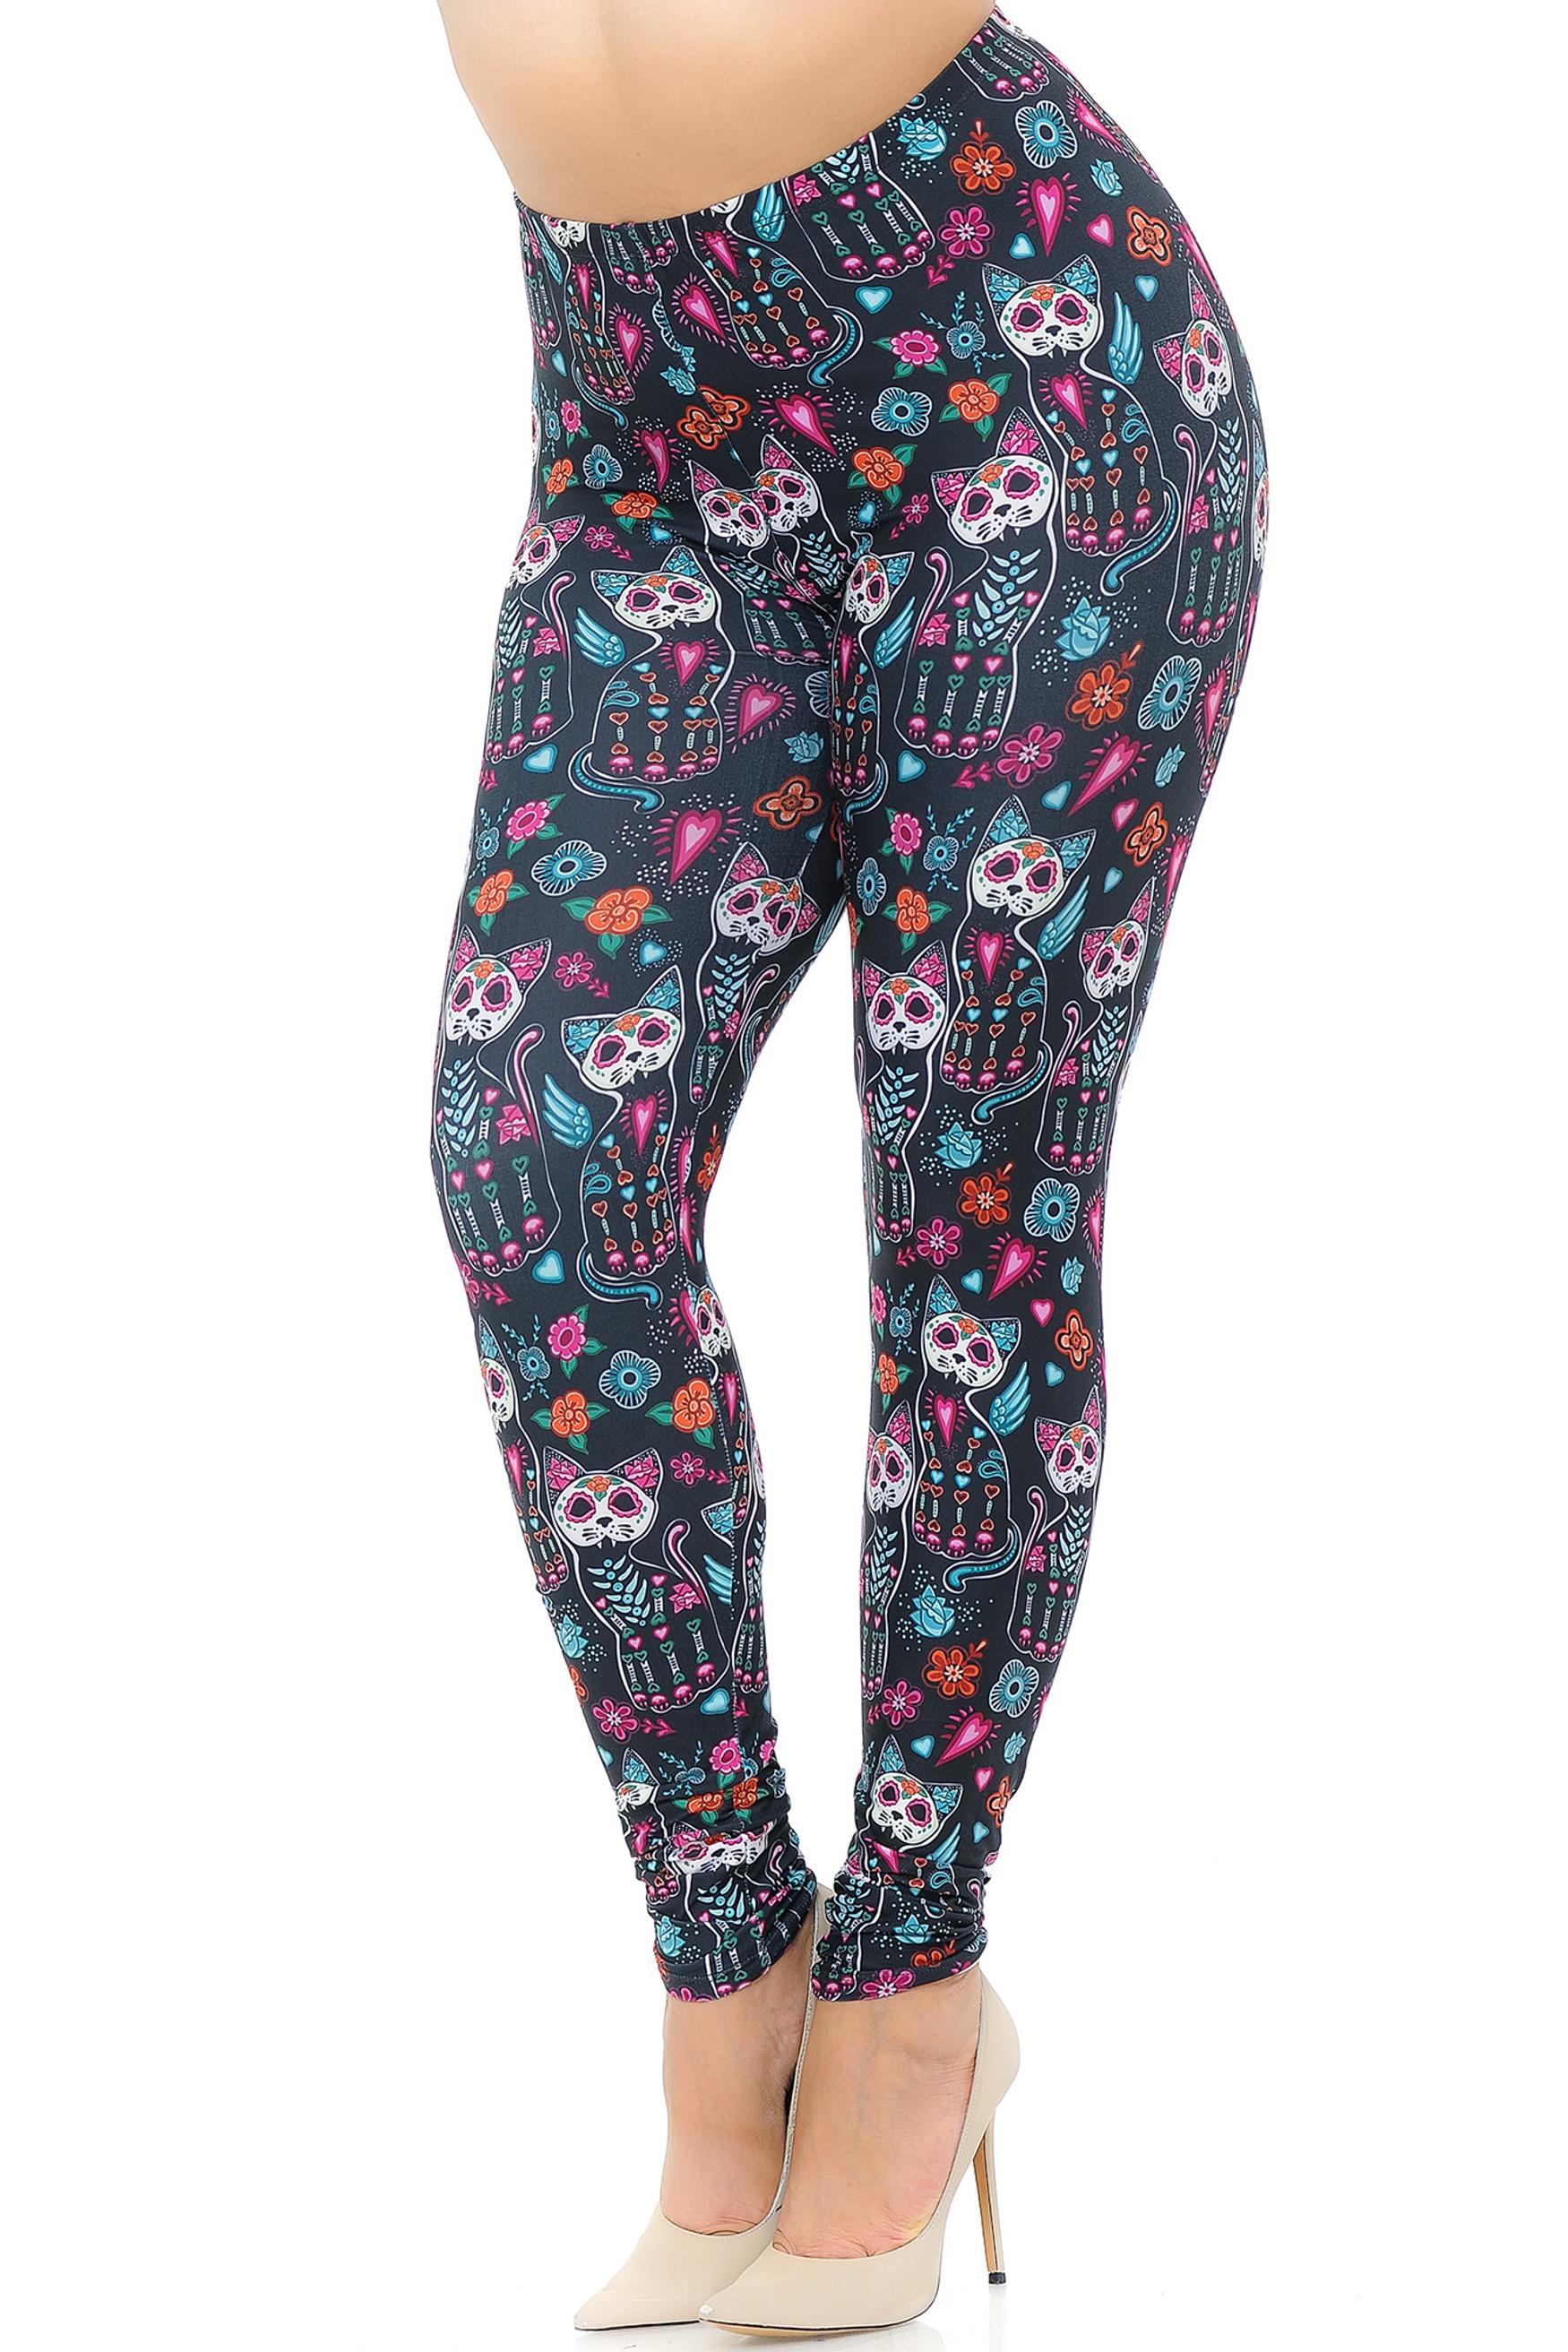 Wholesale Creamy Soft Sugar Skull Kitty Cats Extra Plus Size Leggings - 3X-5X - USA Fashion™